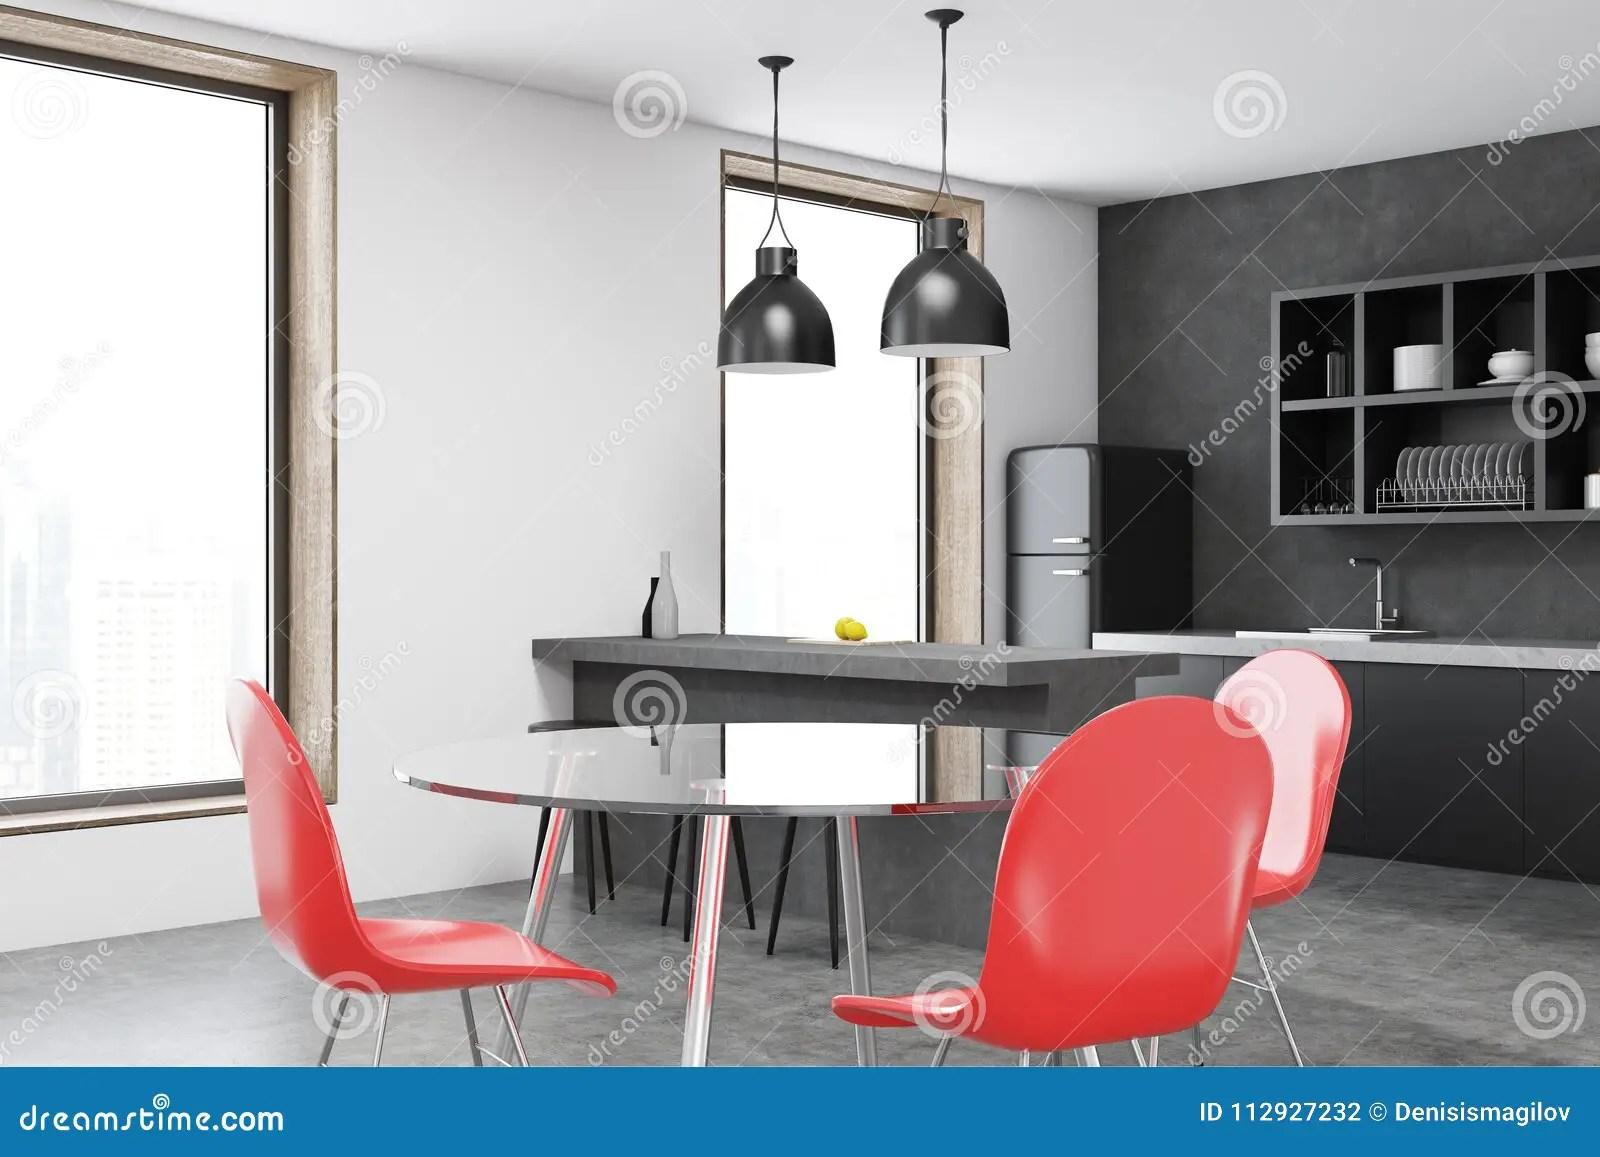 chairs kitchen island with table 红色椅子厨房内部库存例证 插画包括有嘲笑 饮料 弯脚的 豪华 复制 红色椅子厨房内部